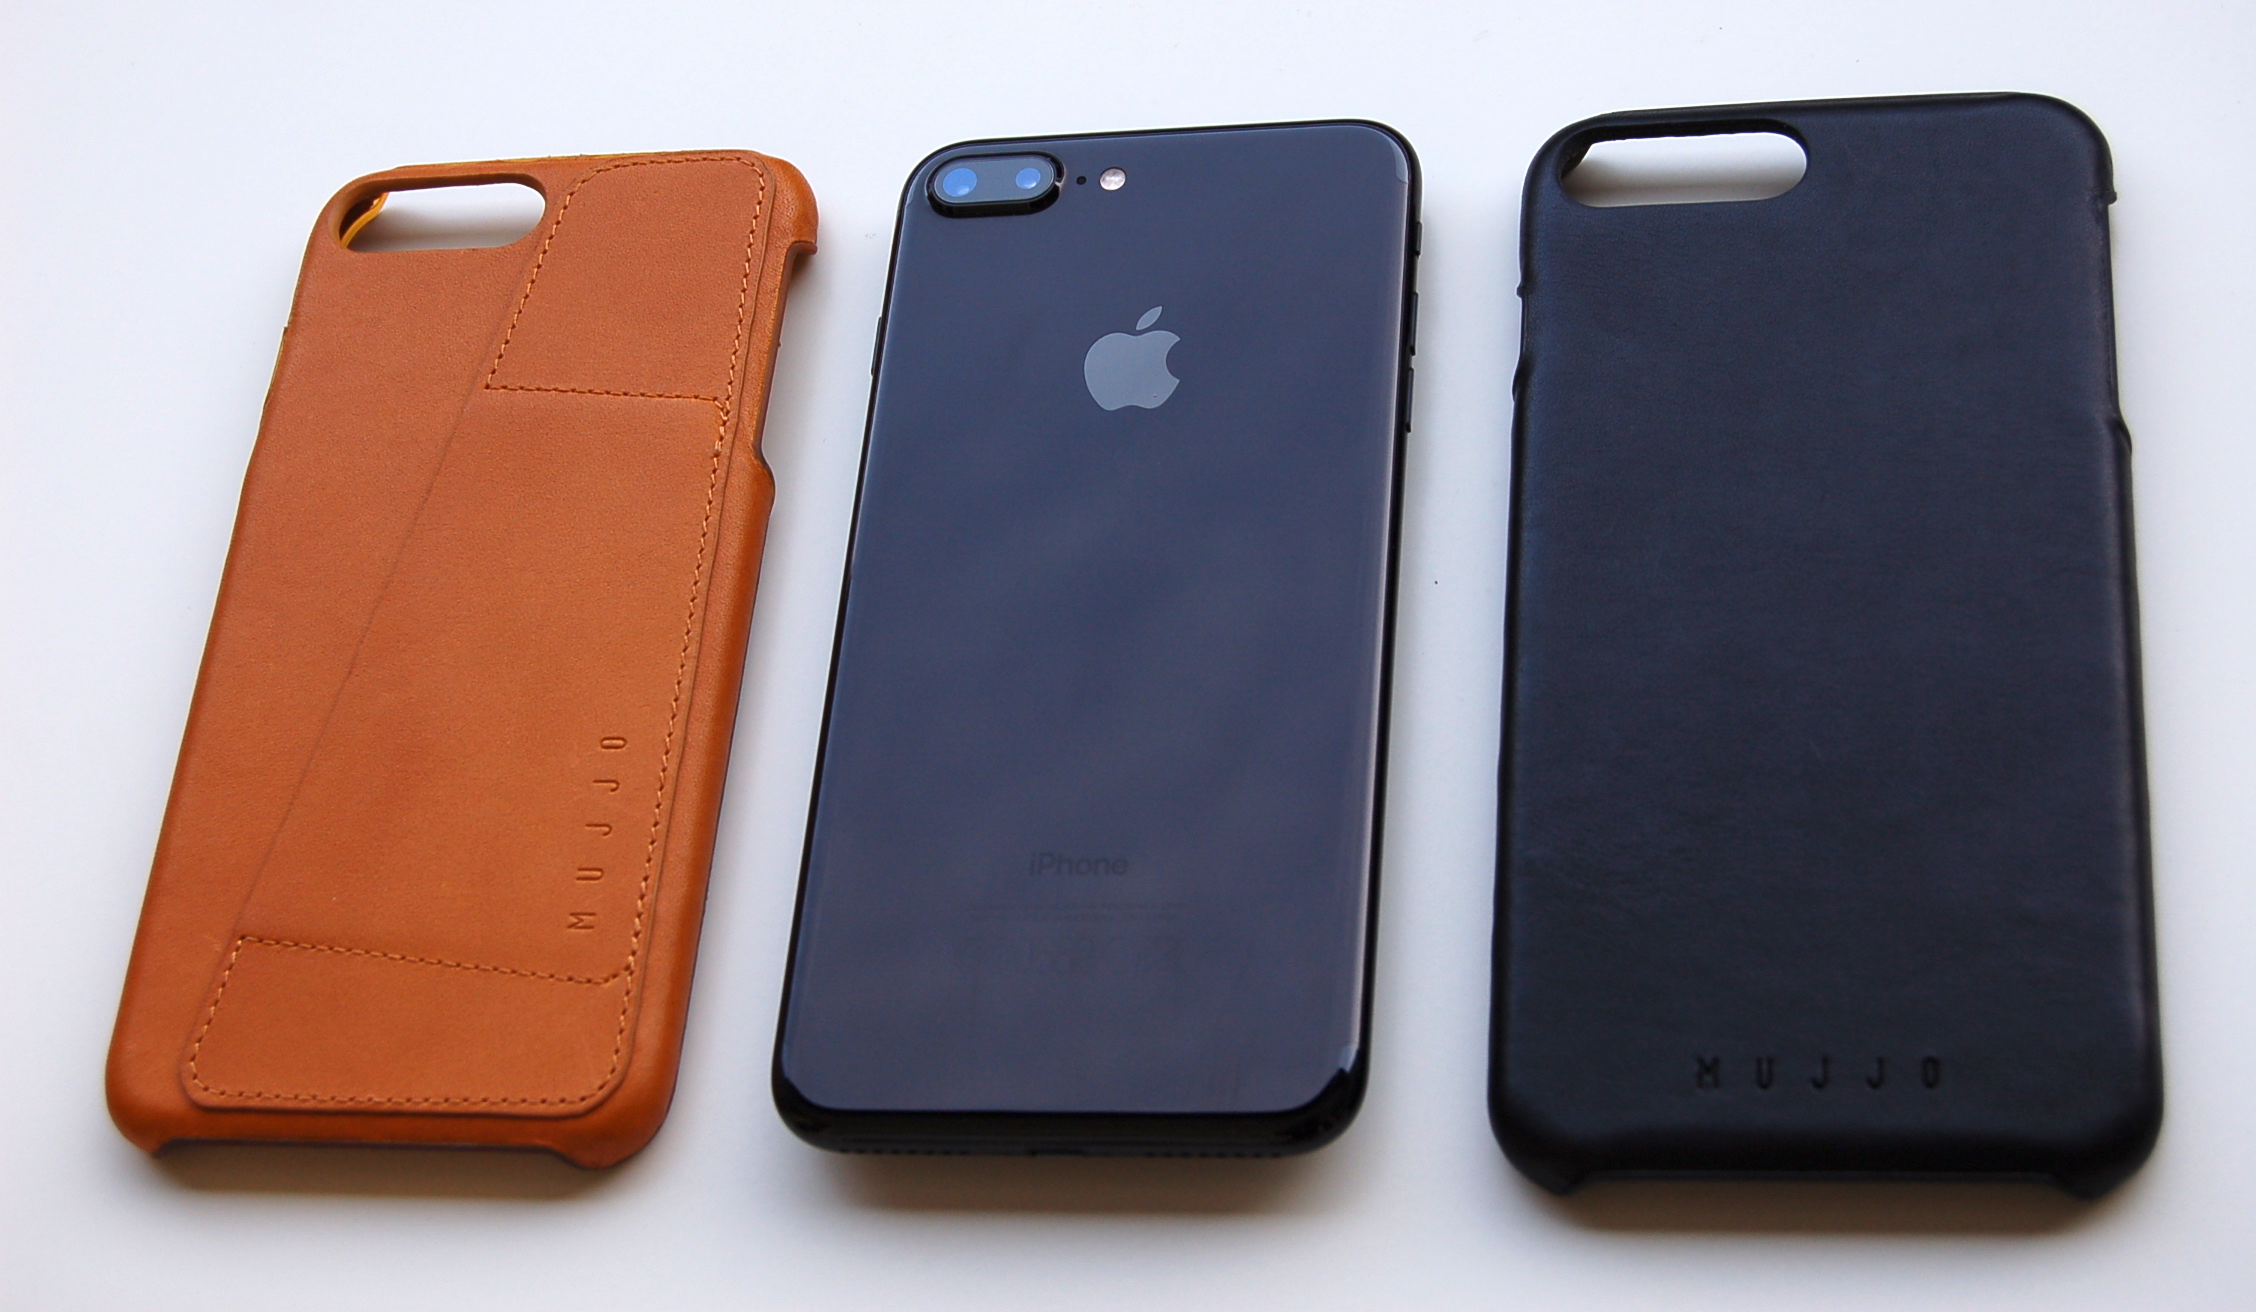 Fundas mujjo para iphone 7 plus an lisis - Fundas cargadoras para iphone ...